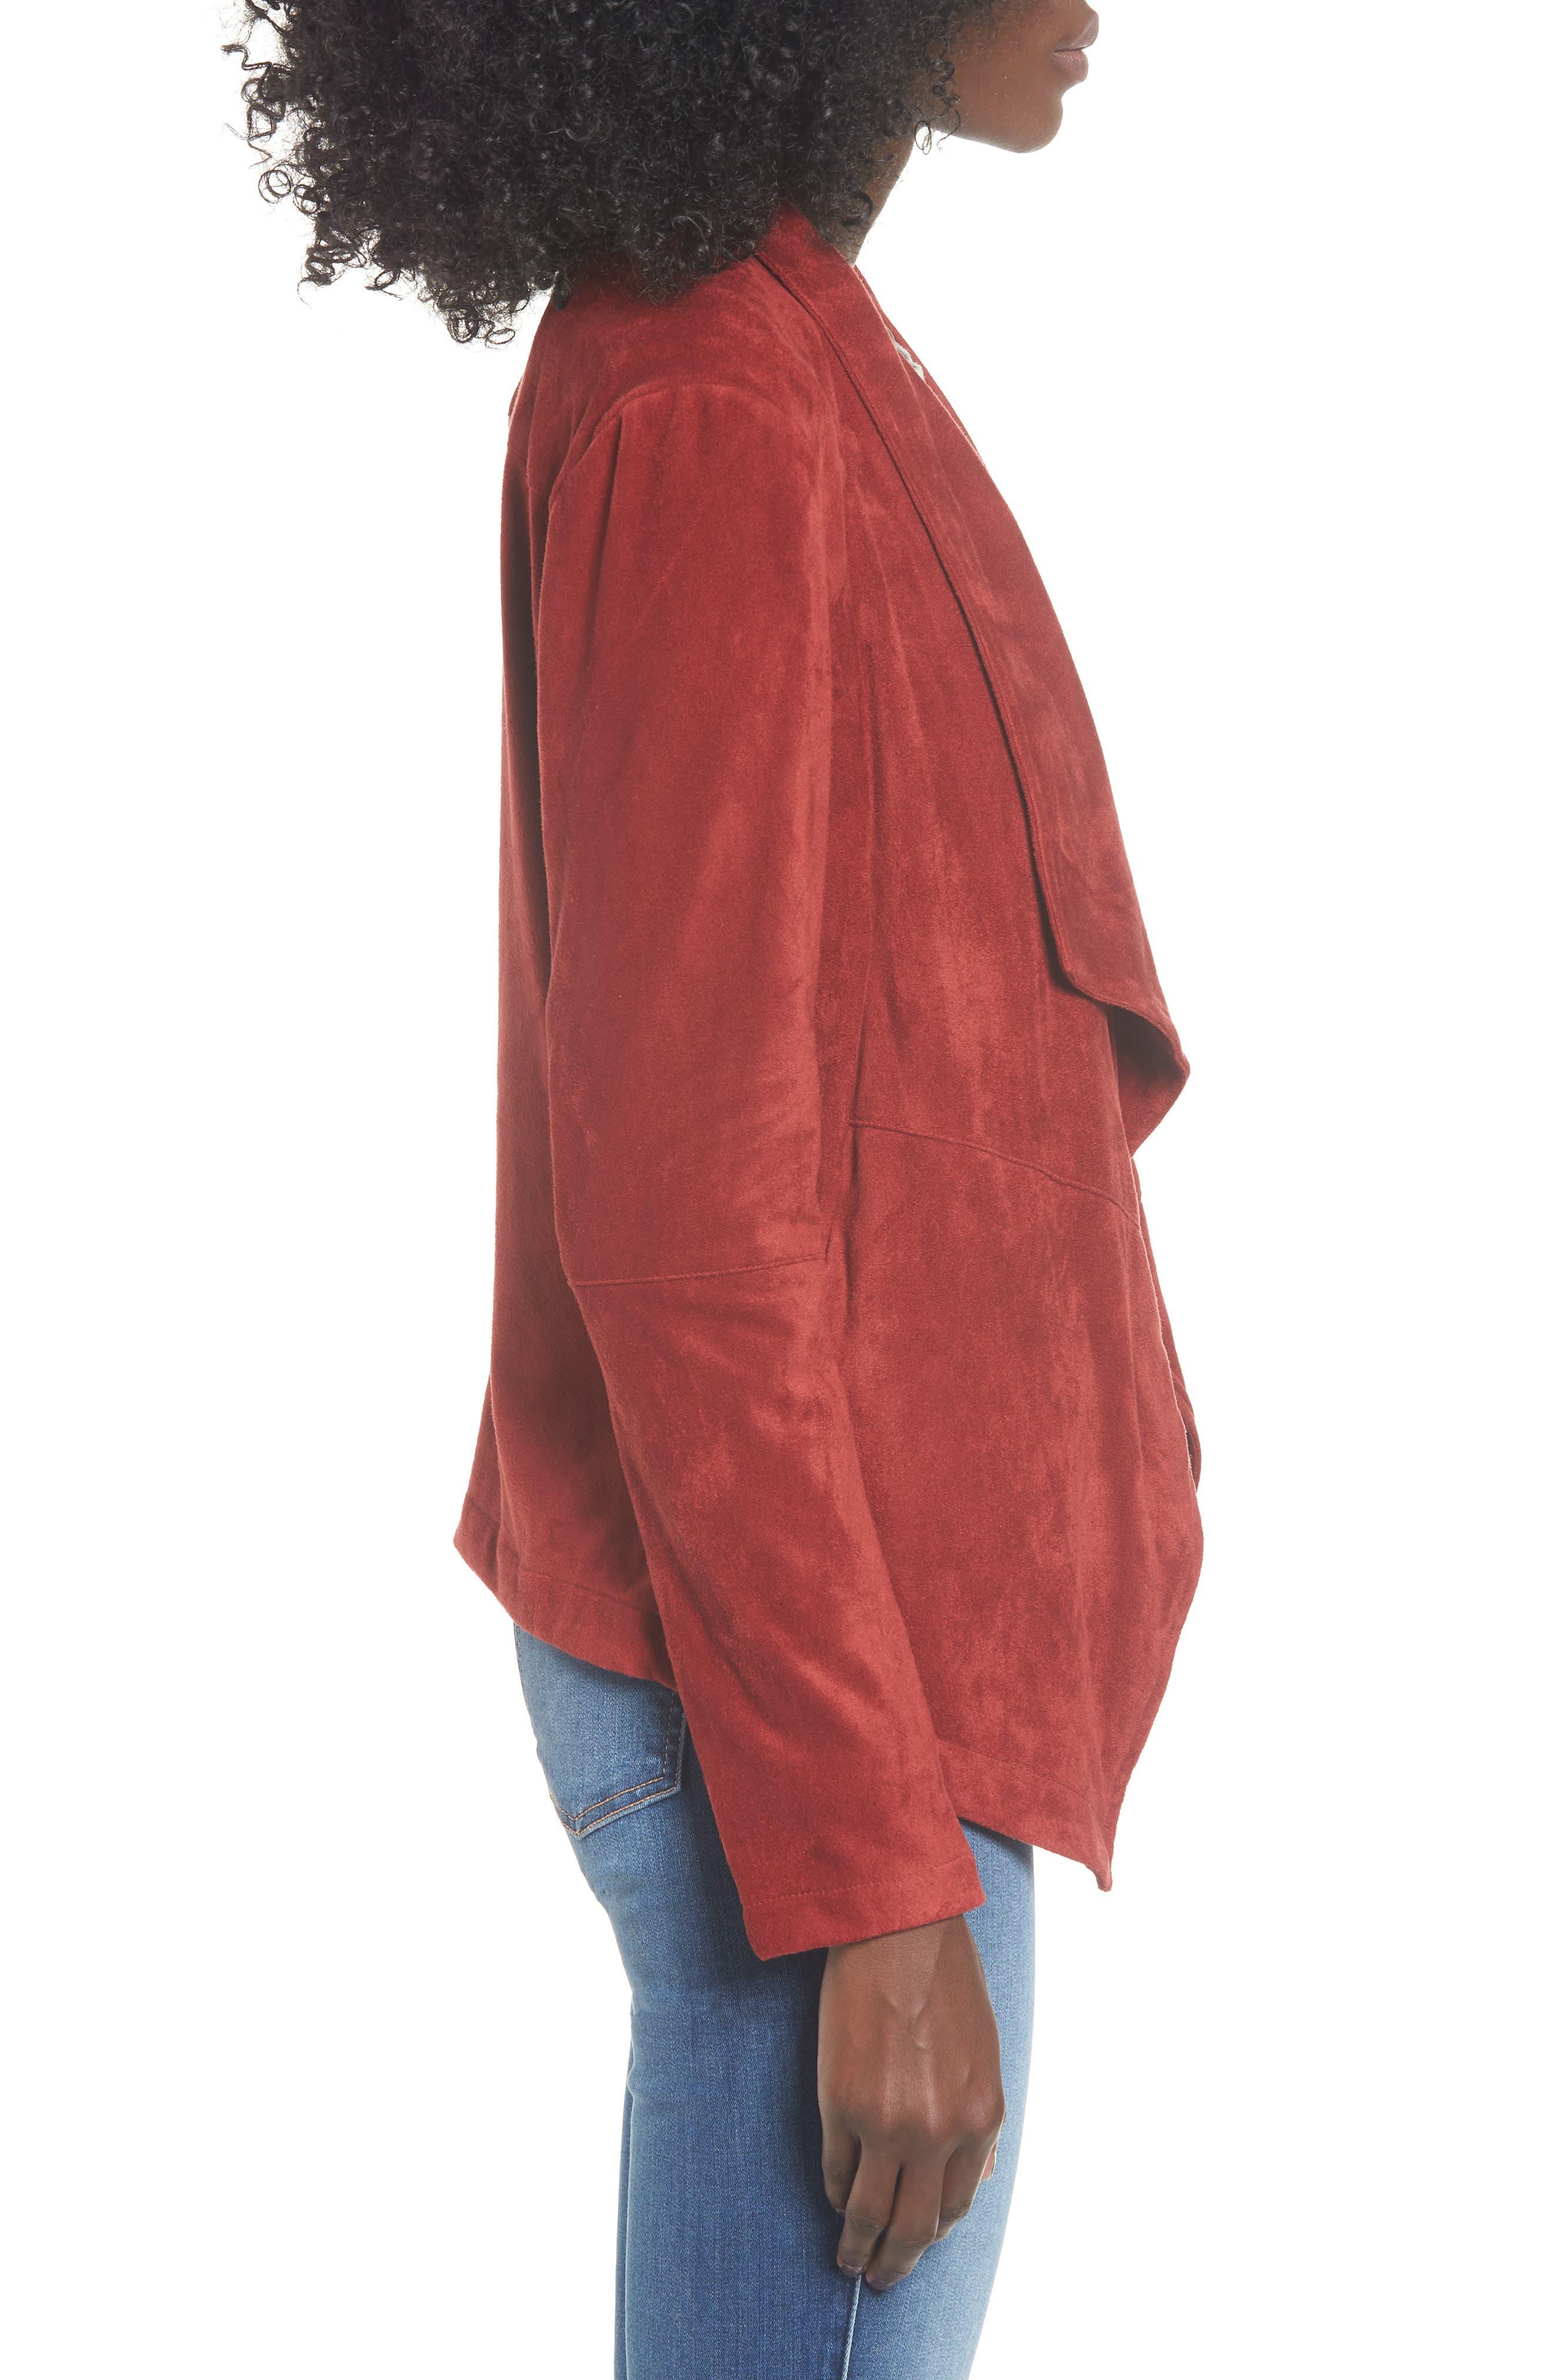 BB DAKOTA,                             Nicholson Faux Suede Drape Front Jacket,                             Alternate thumbnail 4, color,                             BRICK RED